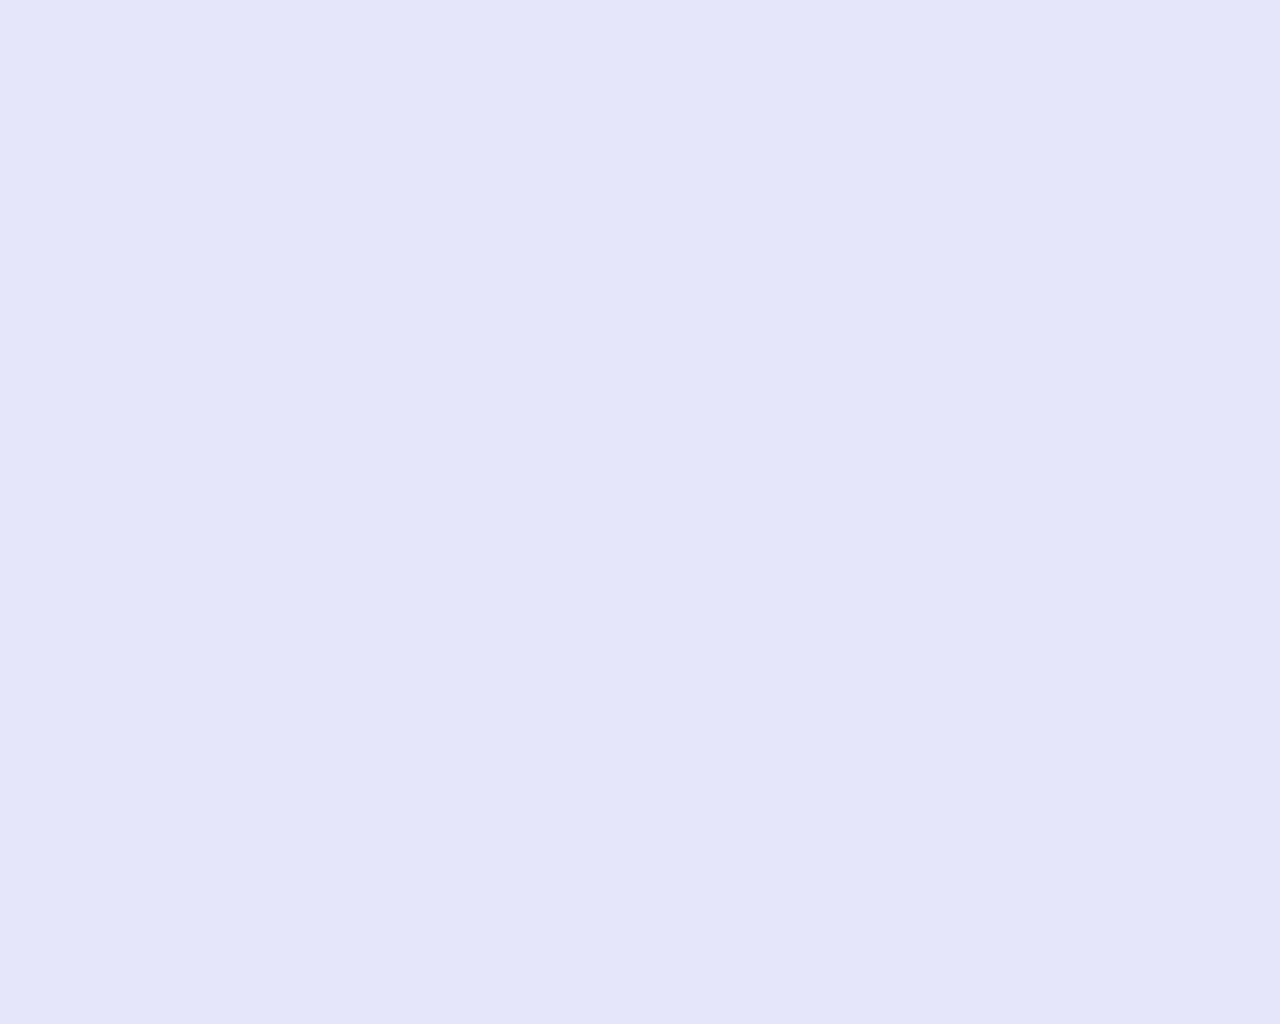 1280x1024 Lavender Web Solid Color Background